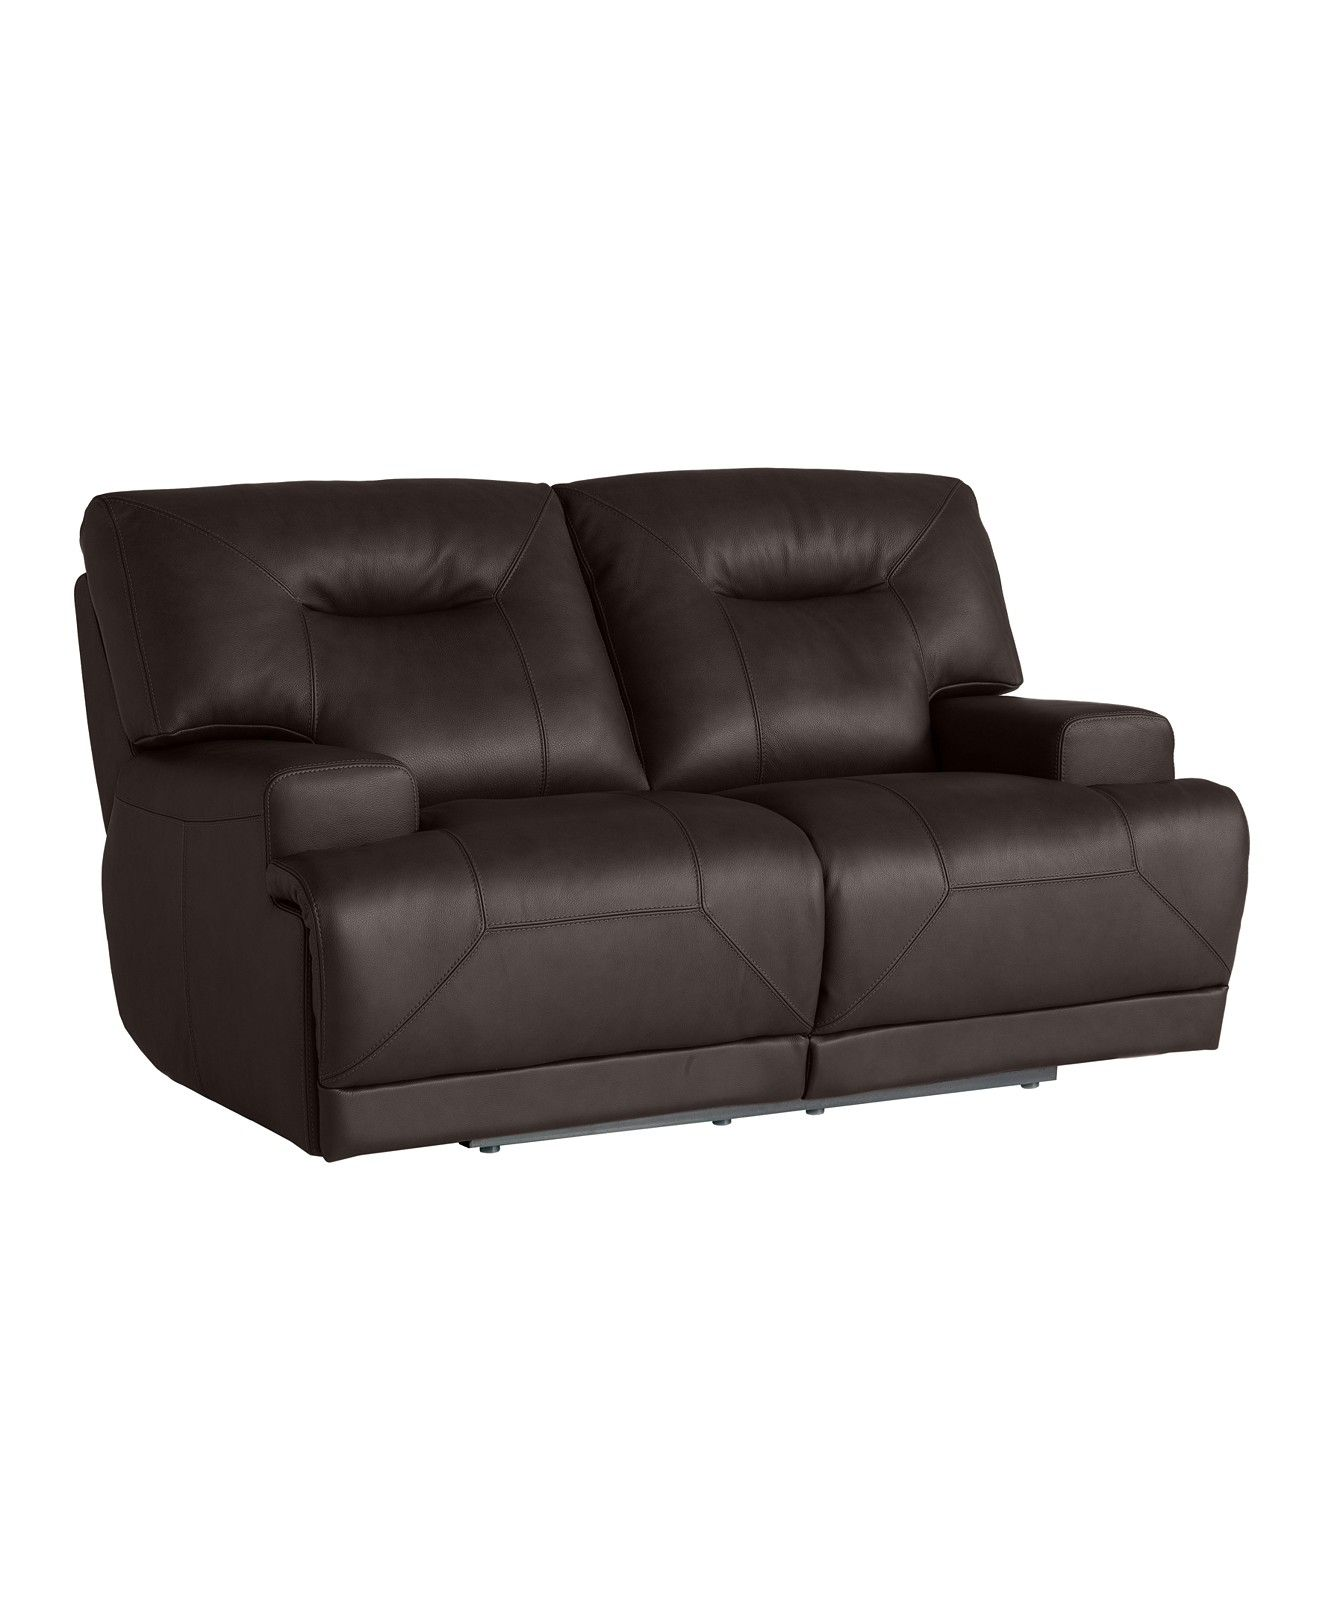 Ricardo Leather Power Reclining Loveseat Furniture Macy s